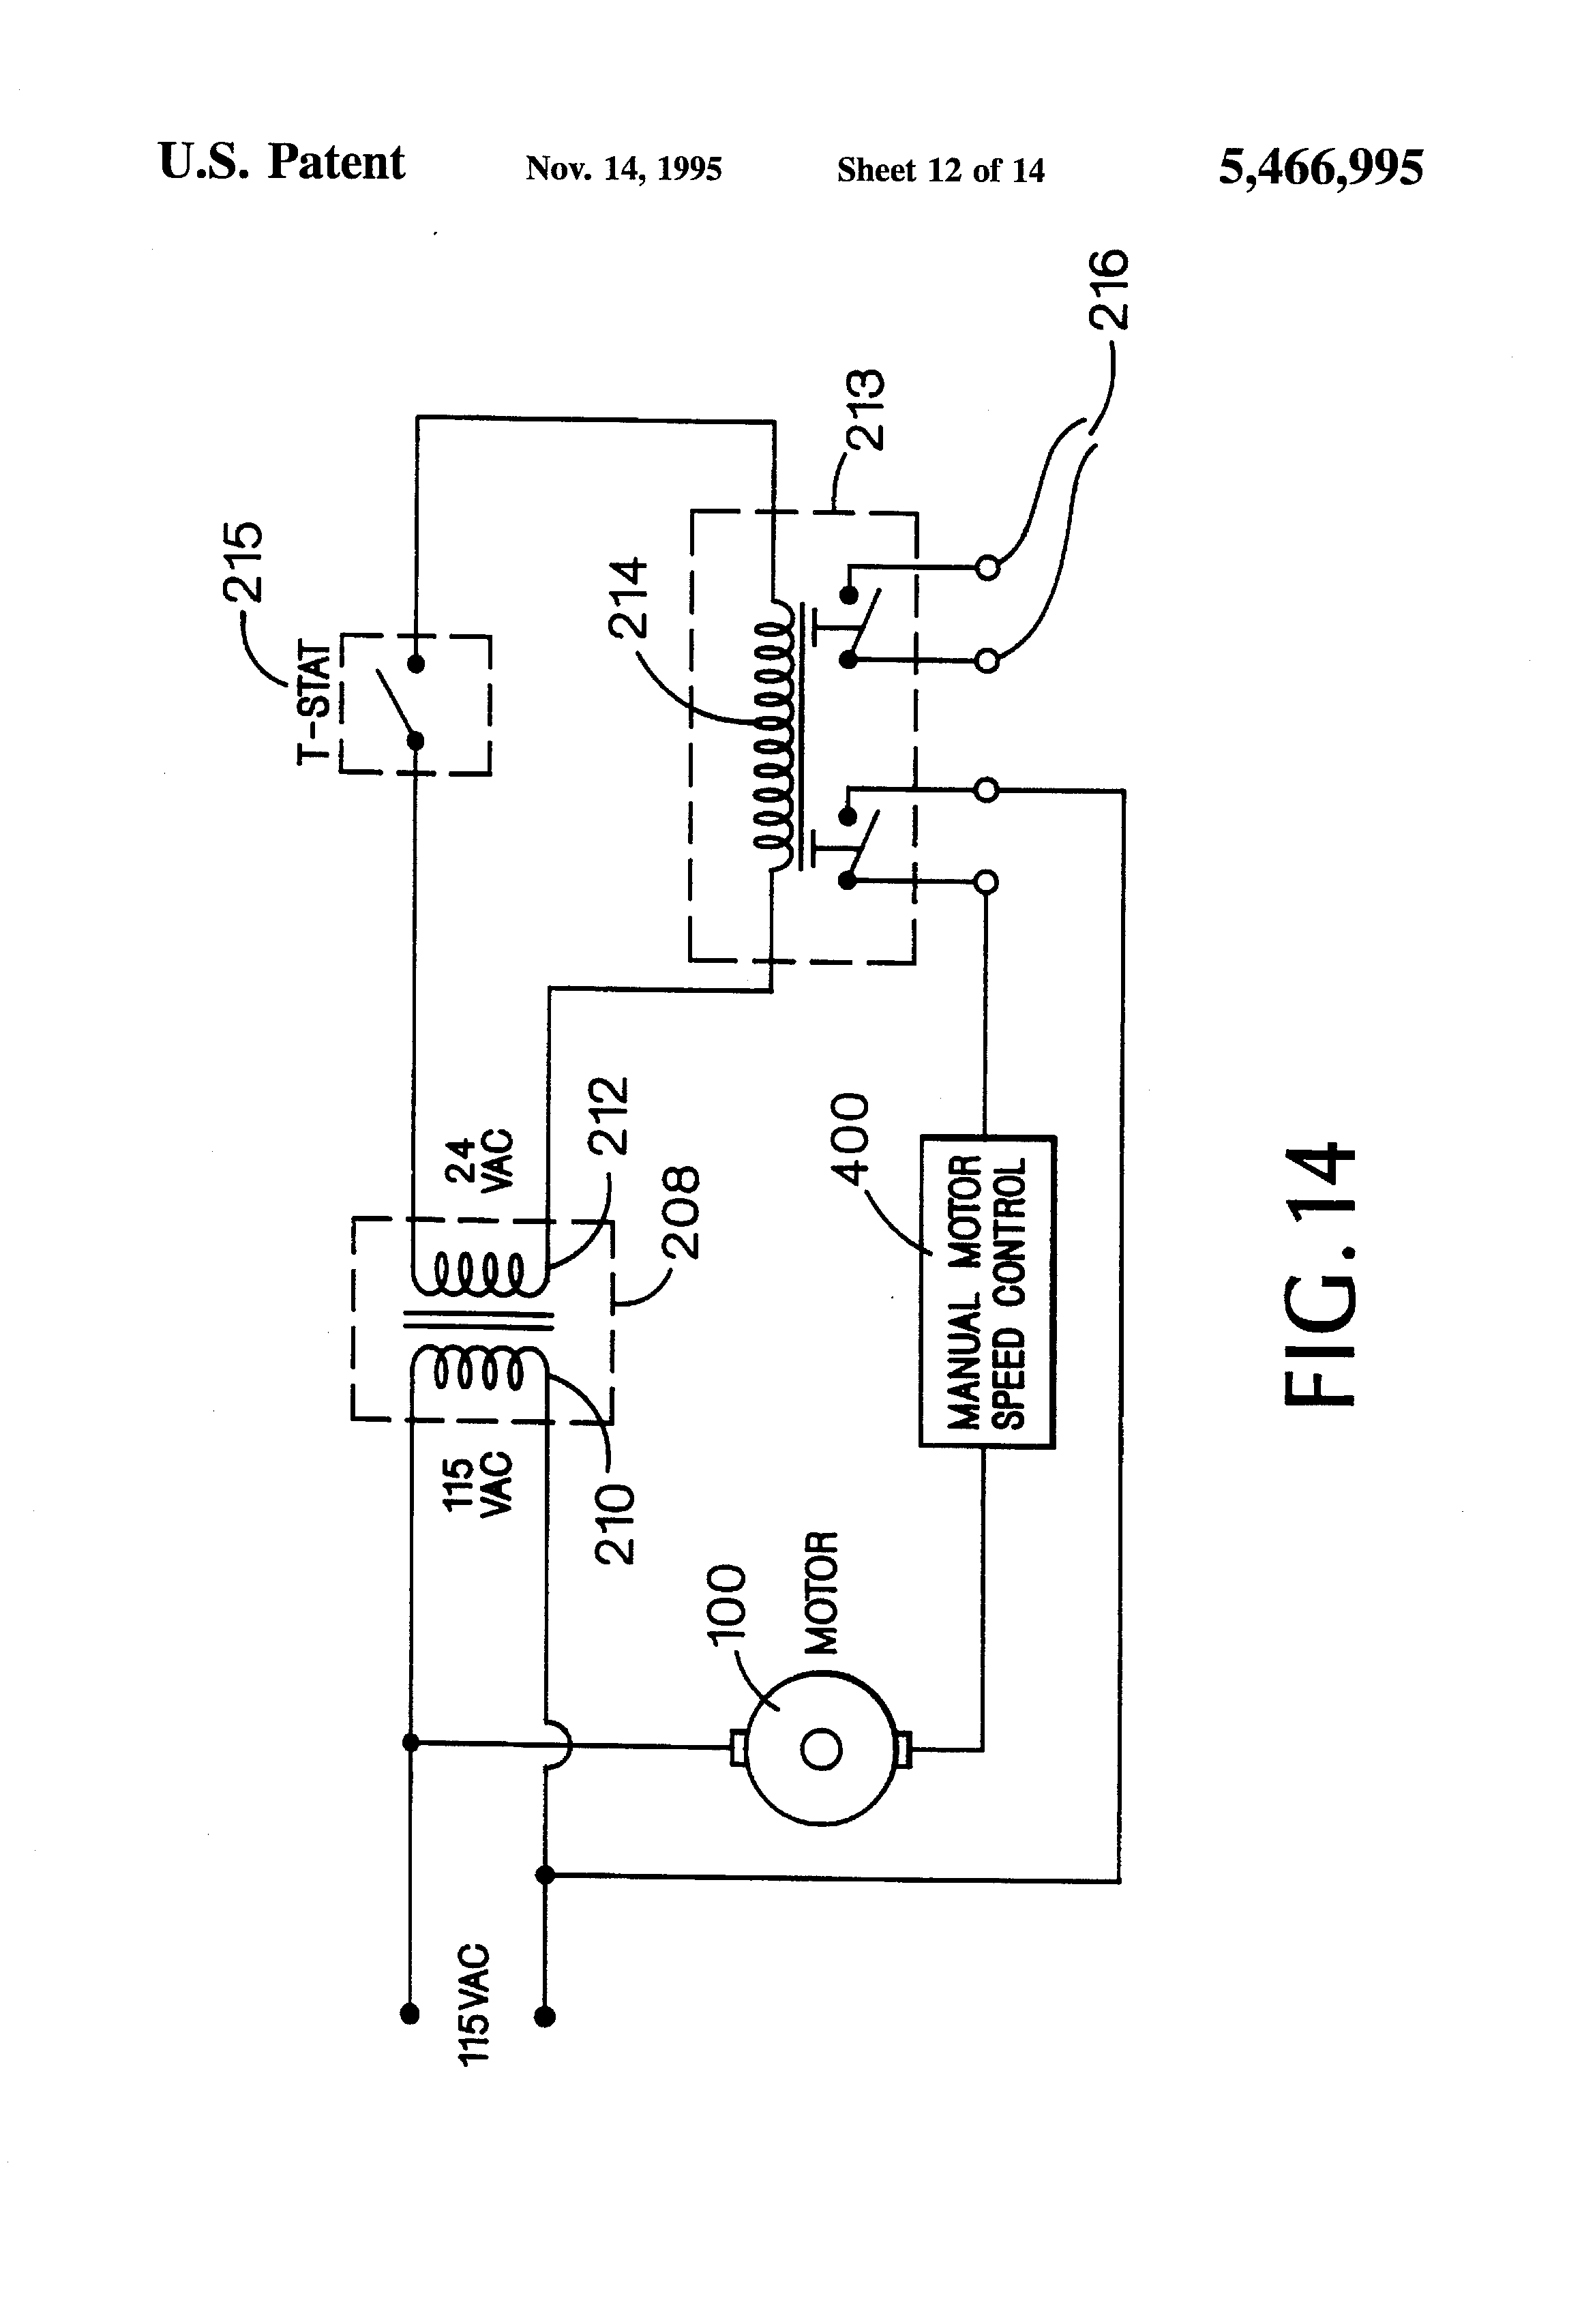 Wiring Diagram Additionally Honeywell Switching Relay Wiring Diagram